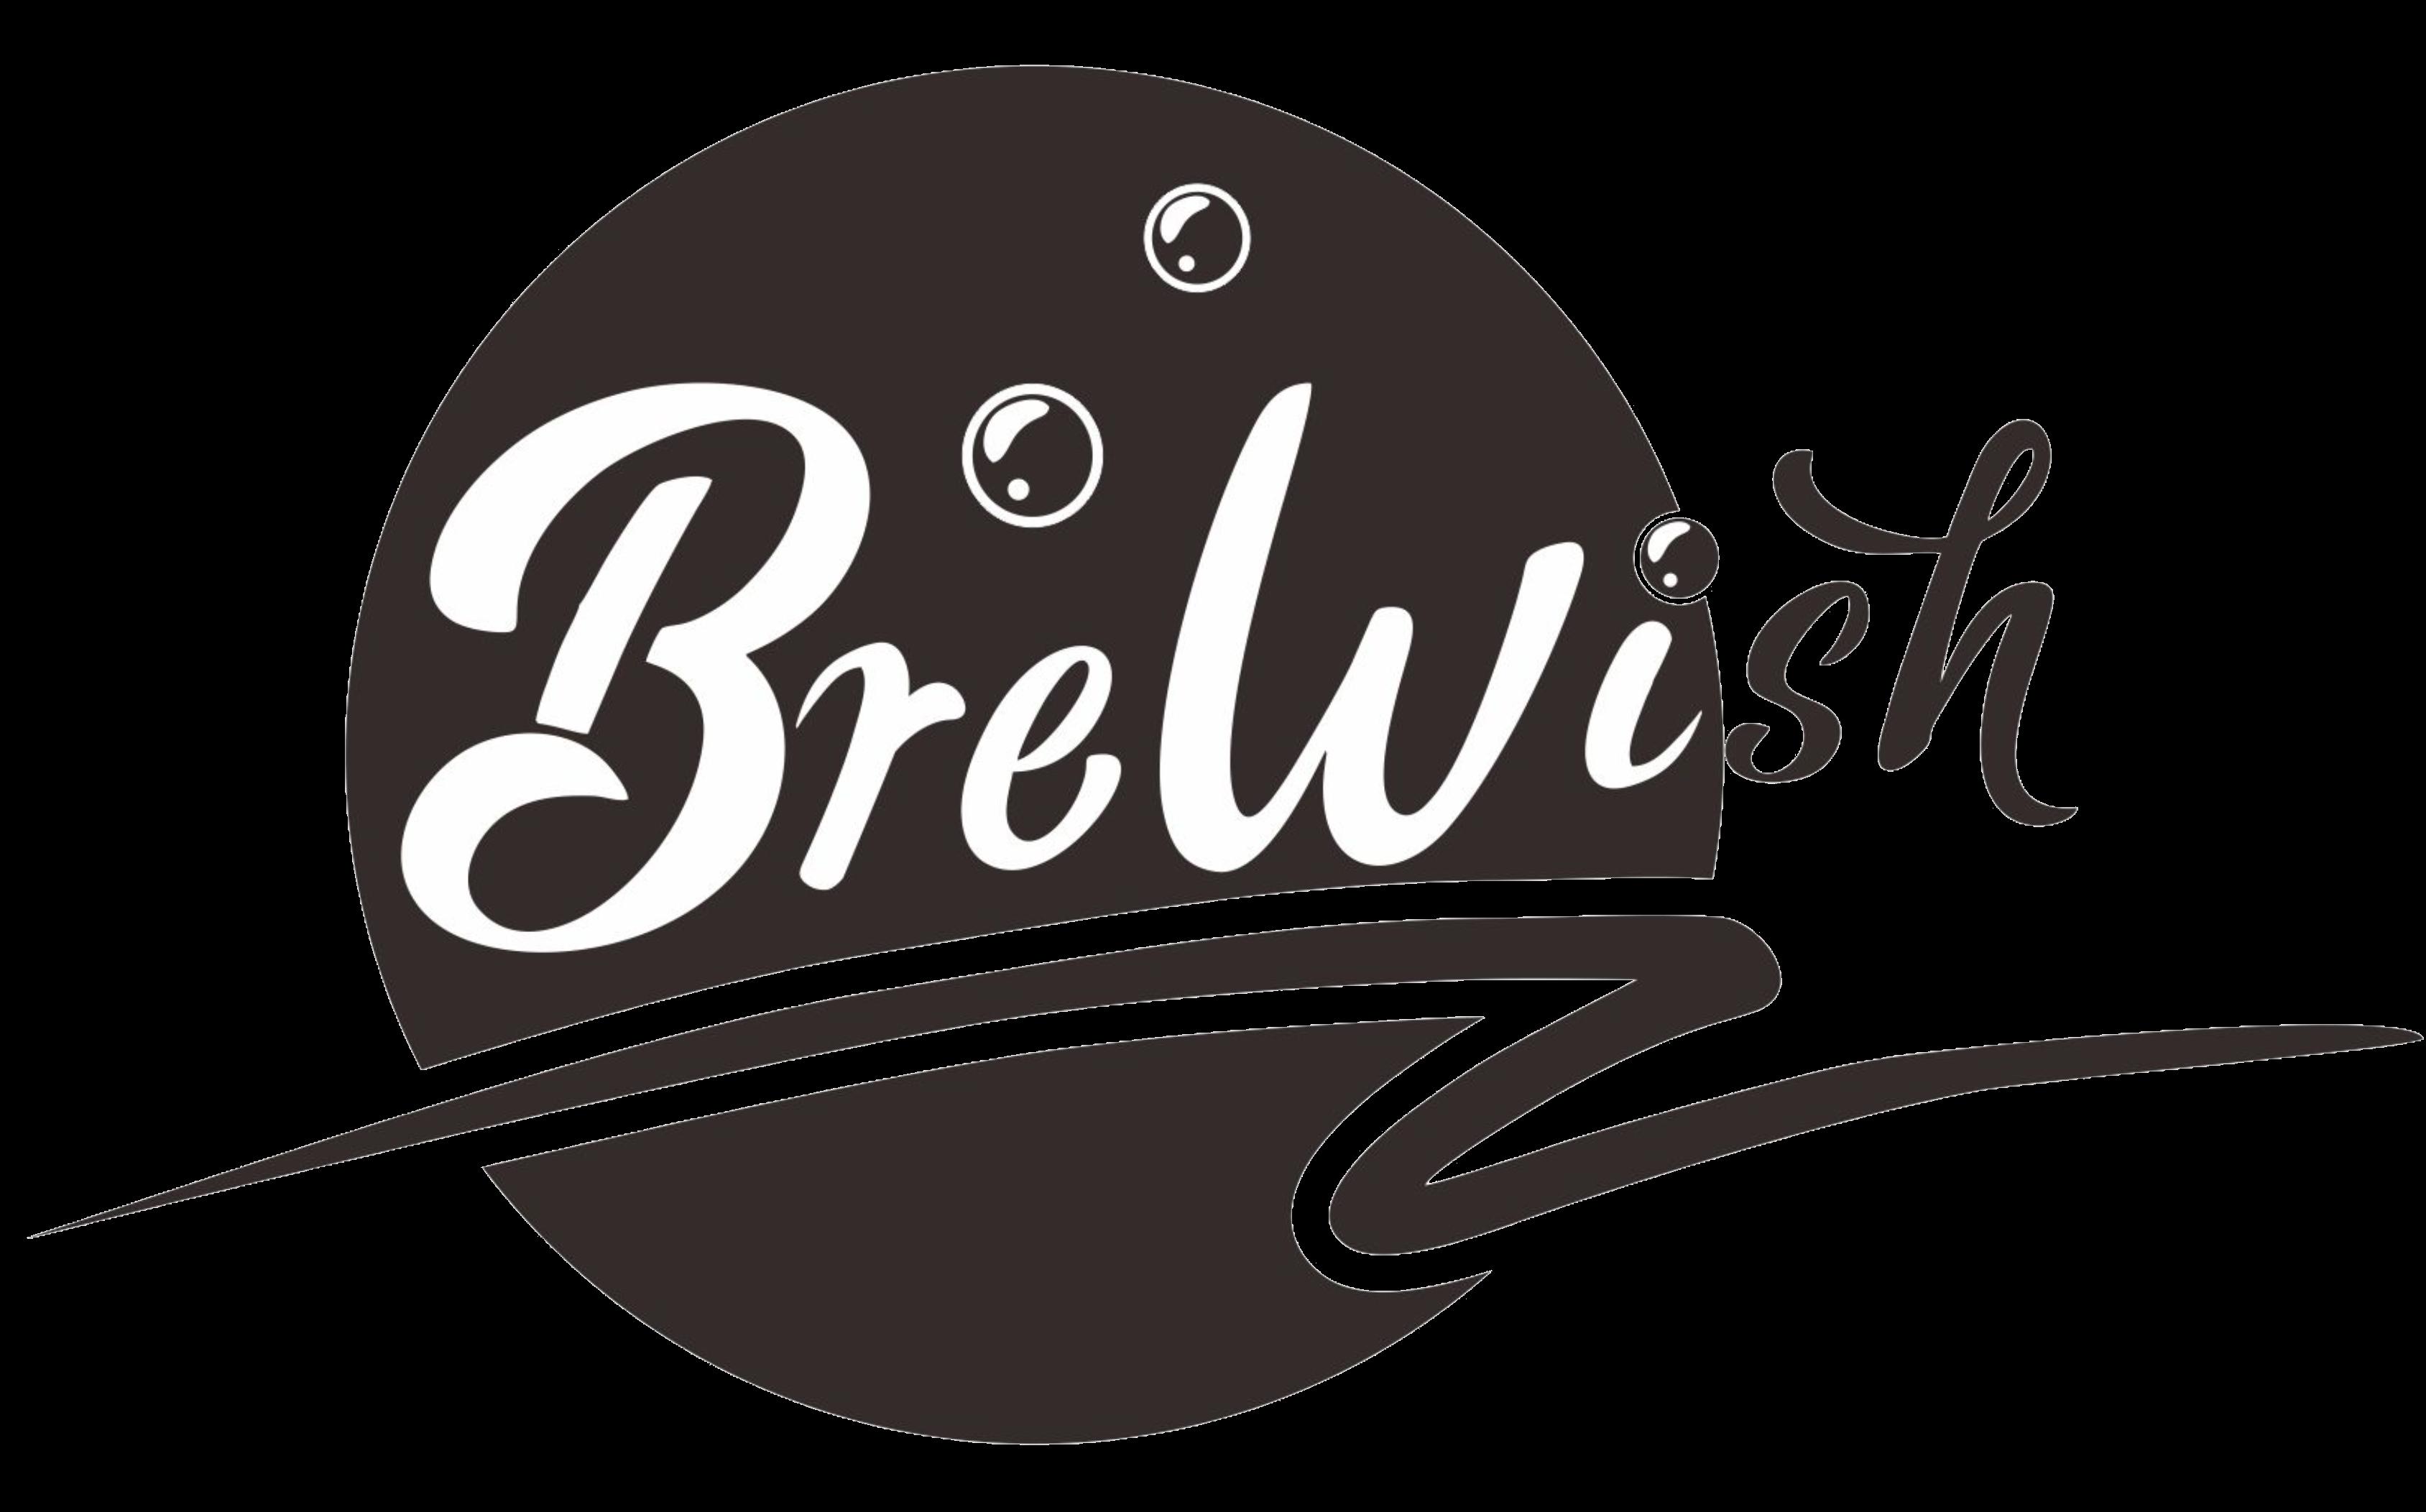 brewish logo